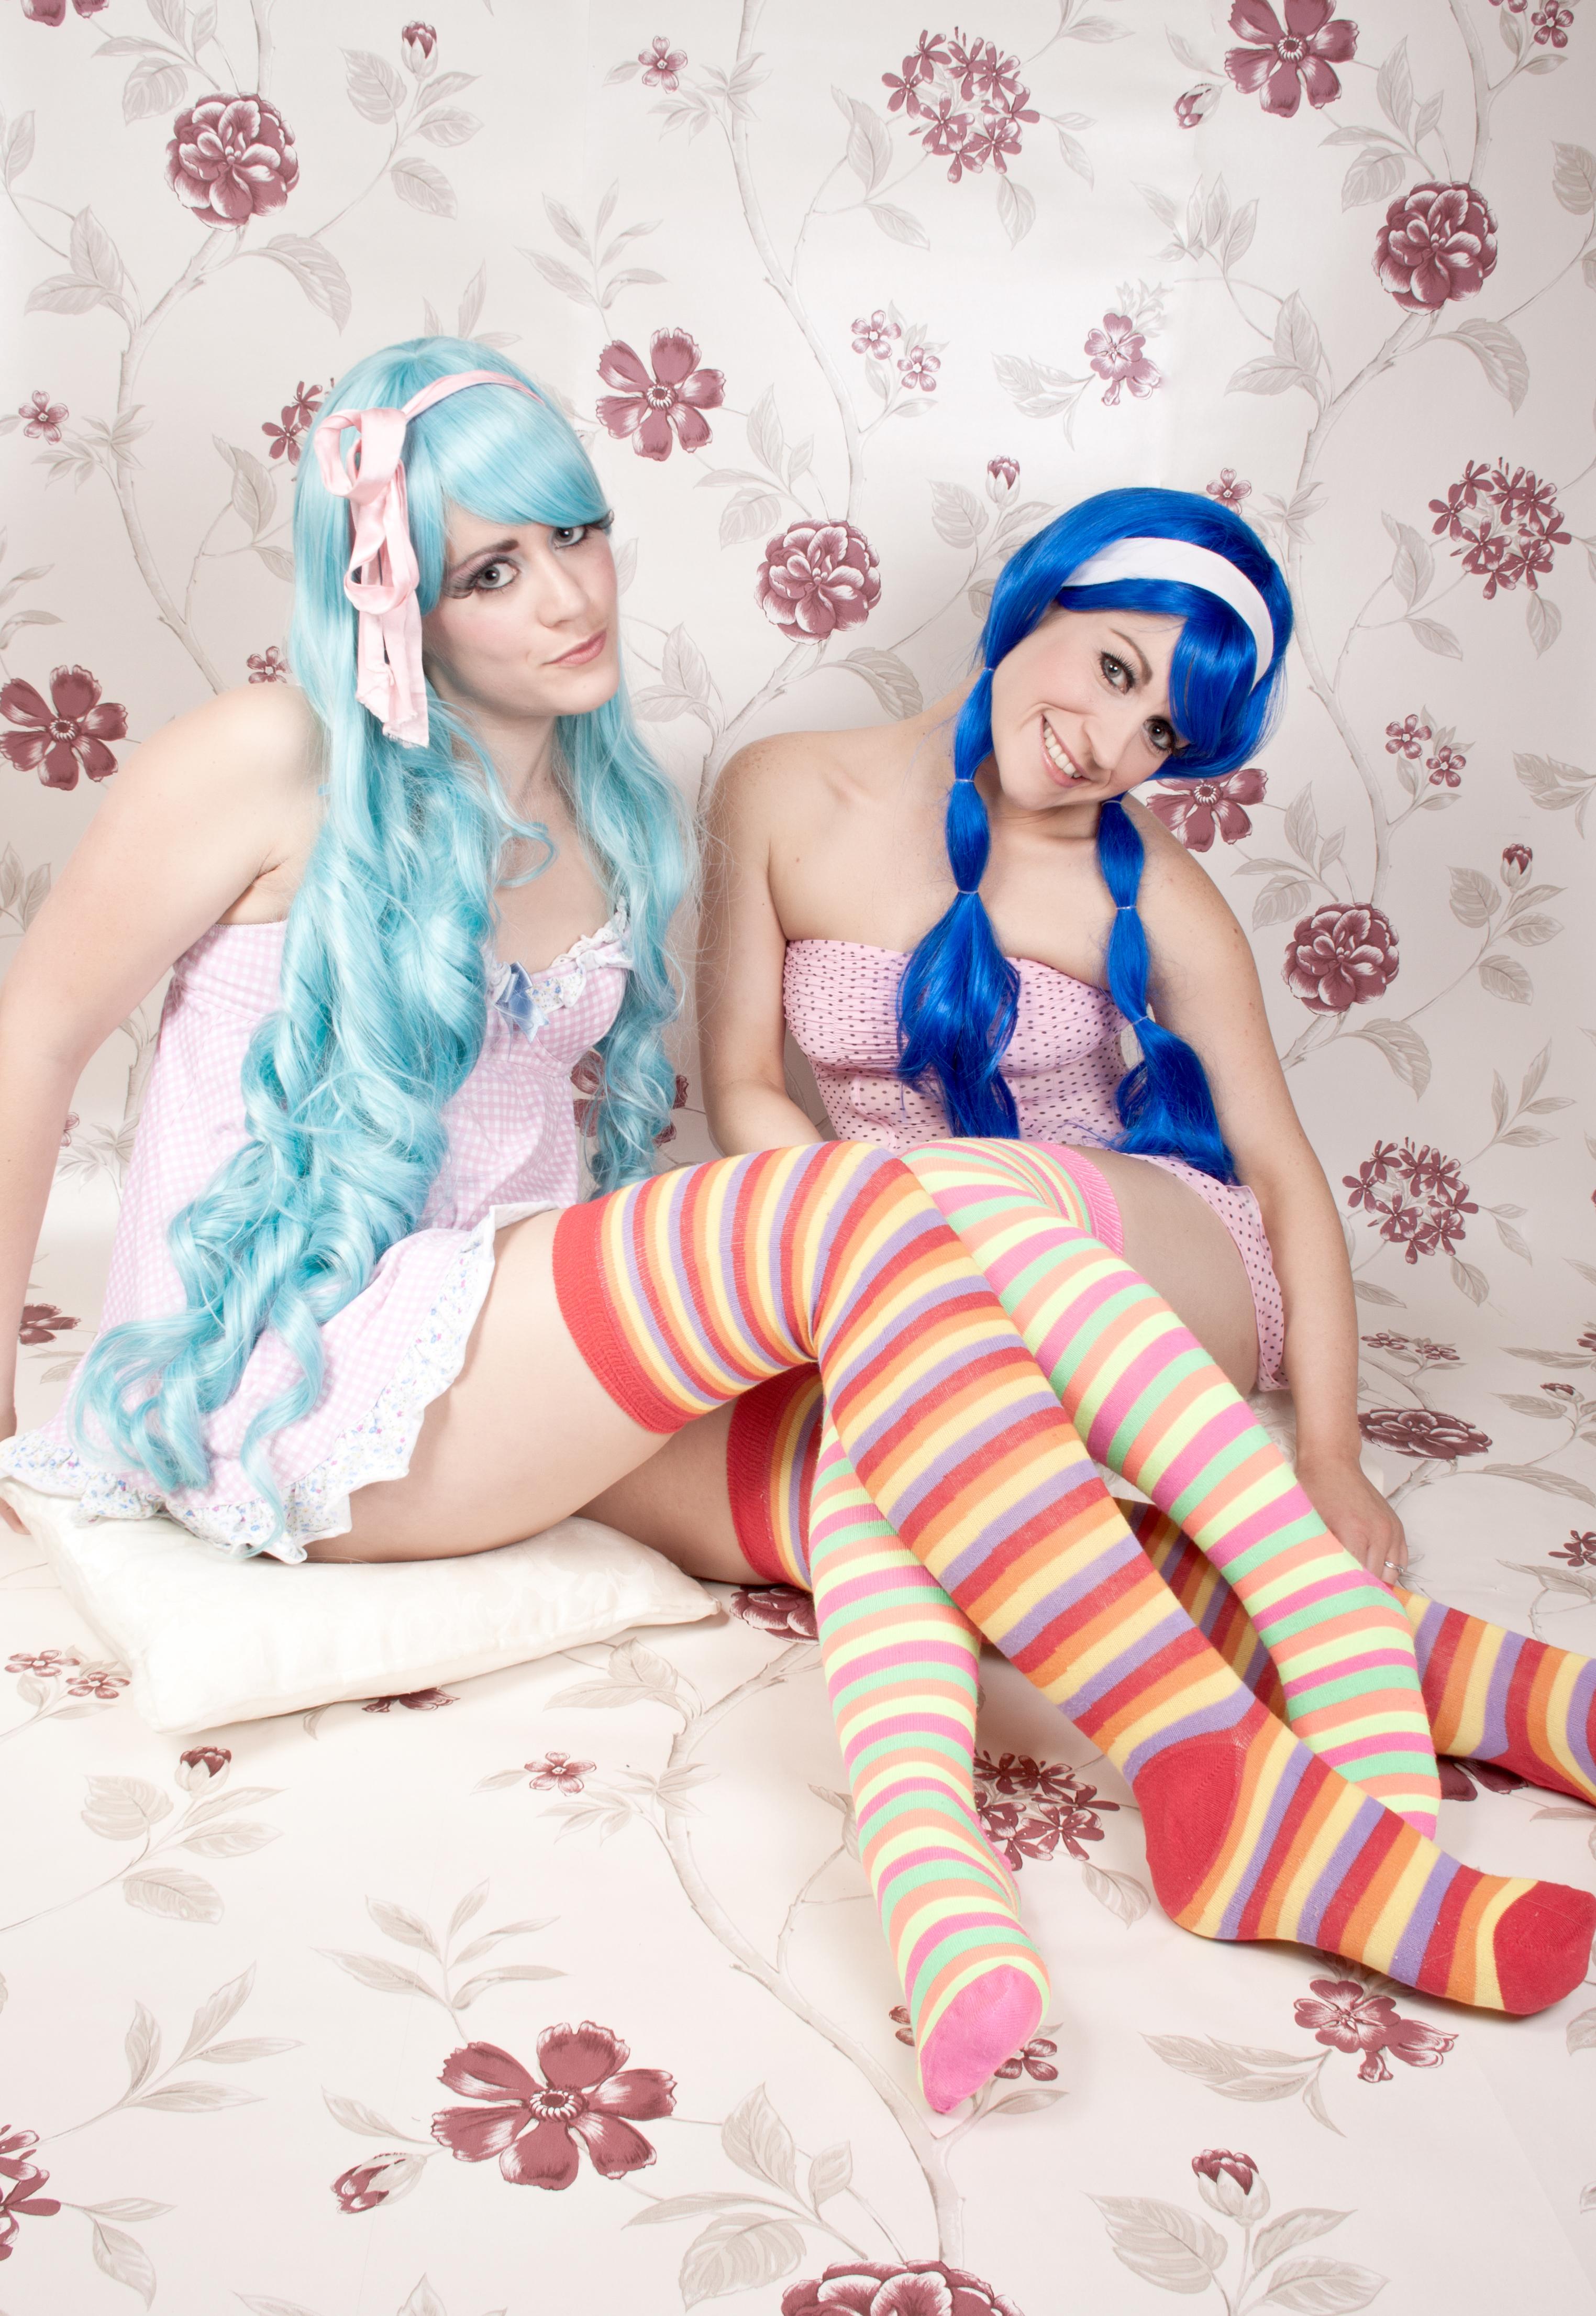 Sexy Socks Manga Girls  Rainbow Long Socks  Tink  Floz -6453